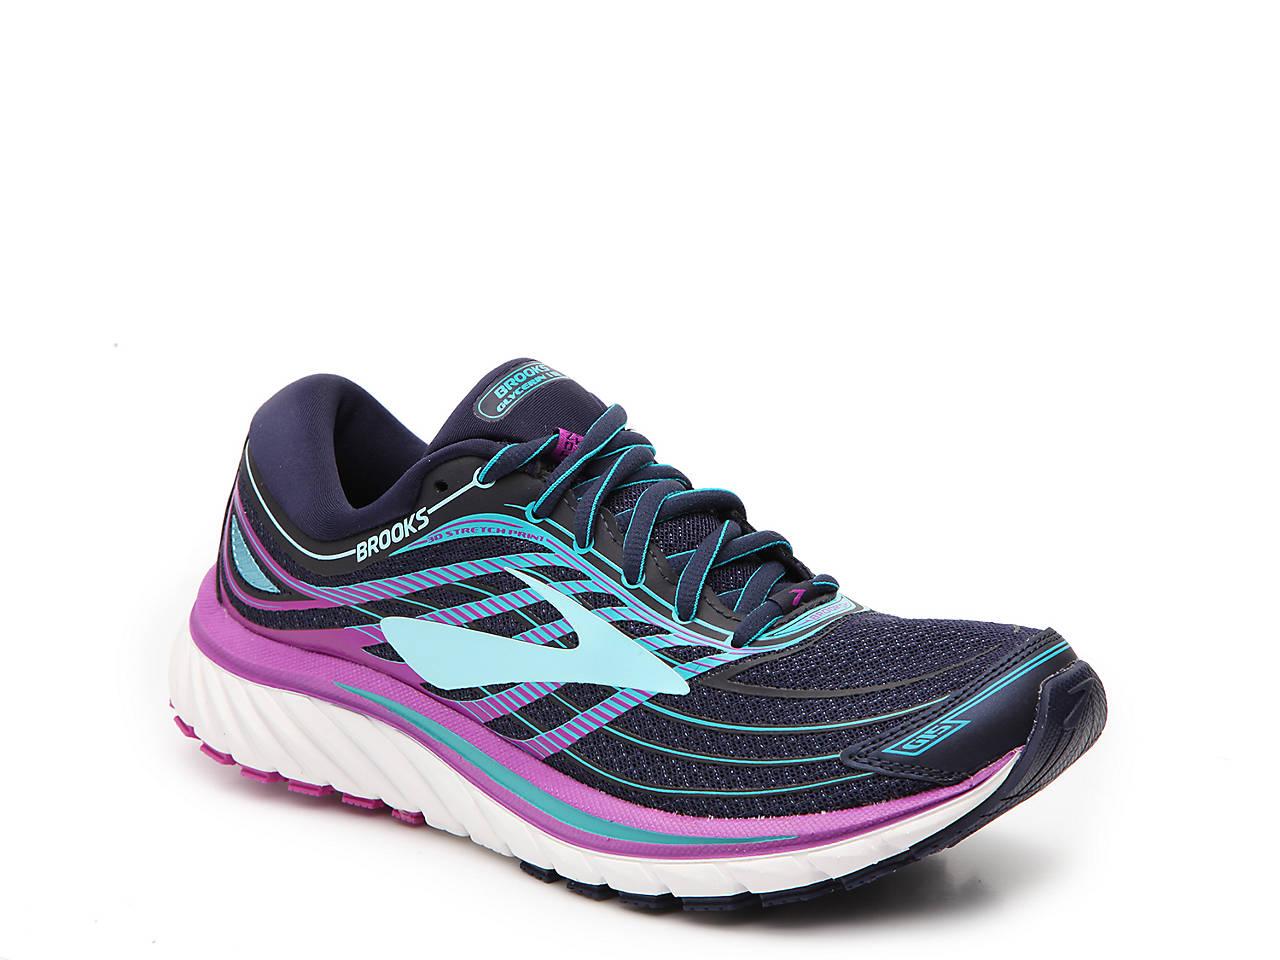 422945da769 Brooks Glycerin 15 Performance Running Shoe - Women s Women s Shoes ...